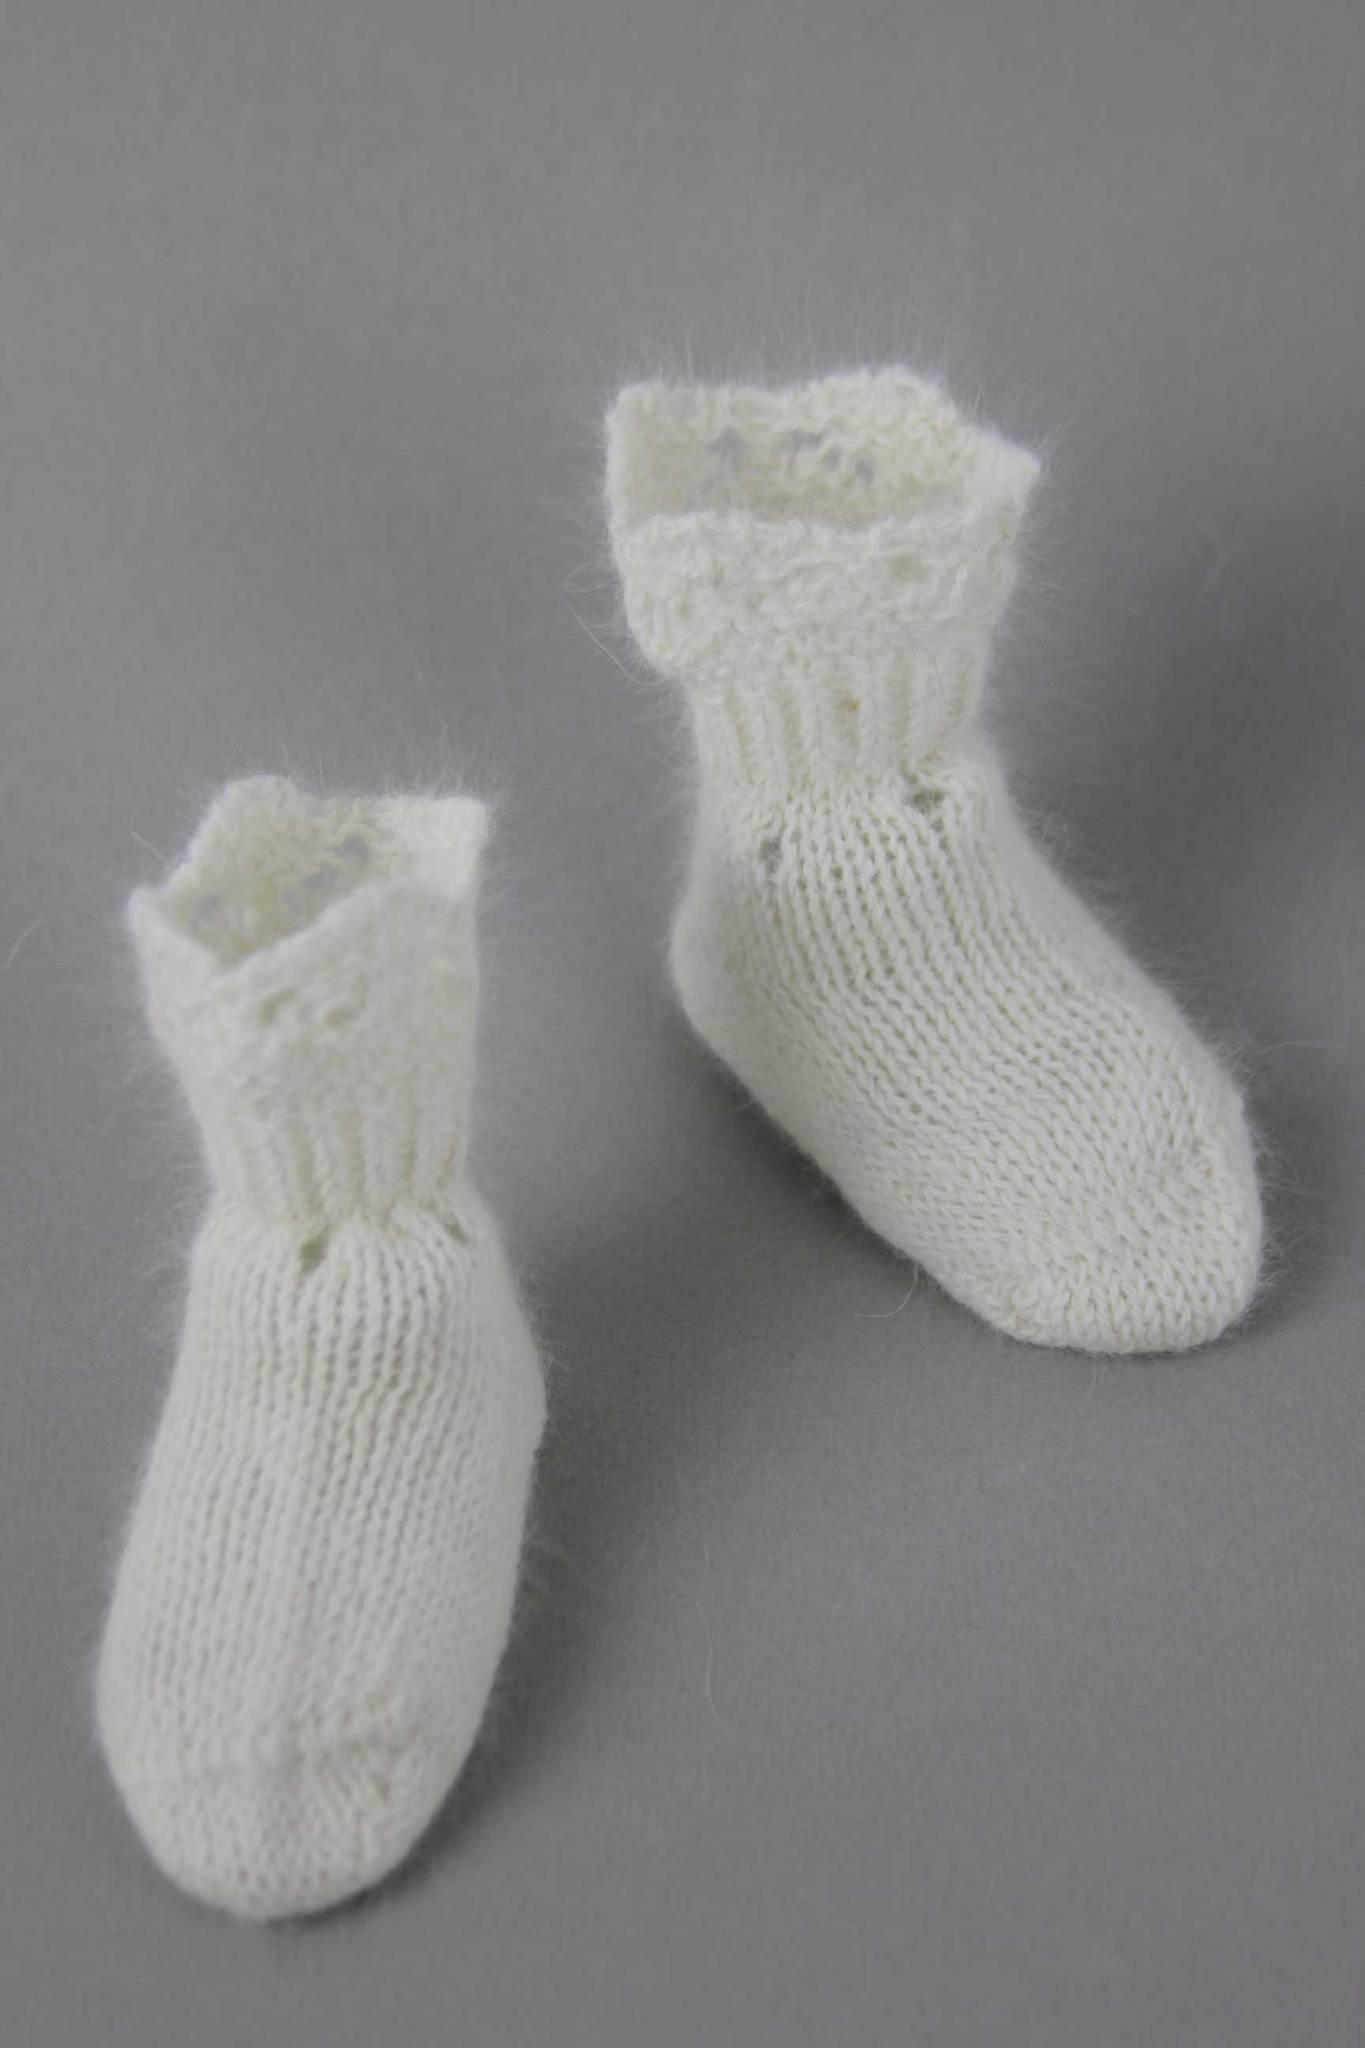 Angora_newborn_lace_socks_white